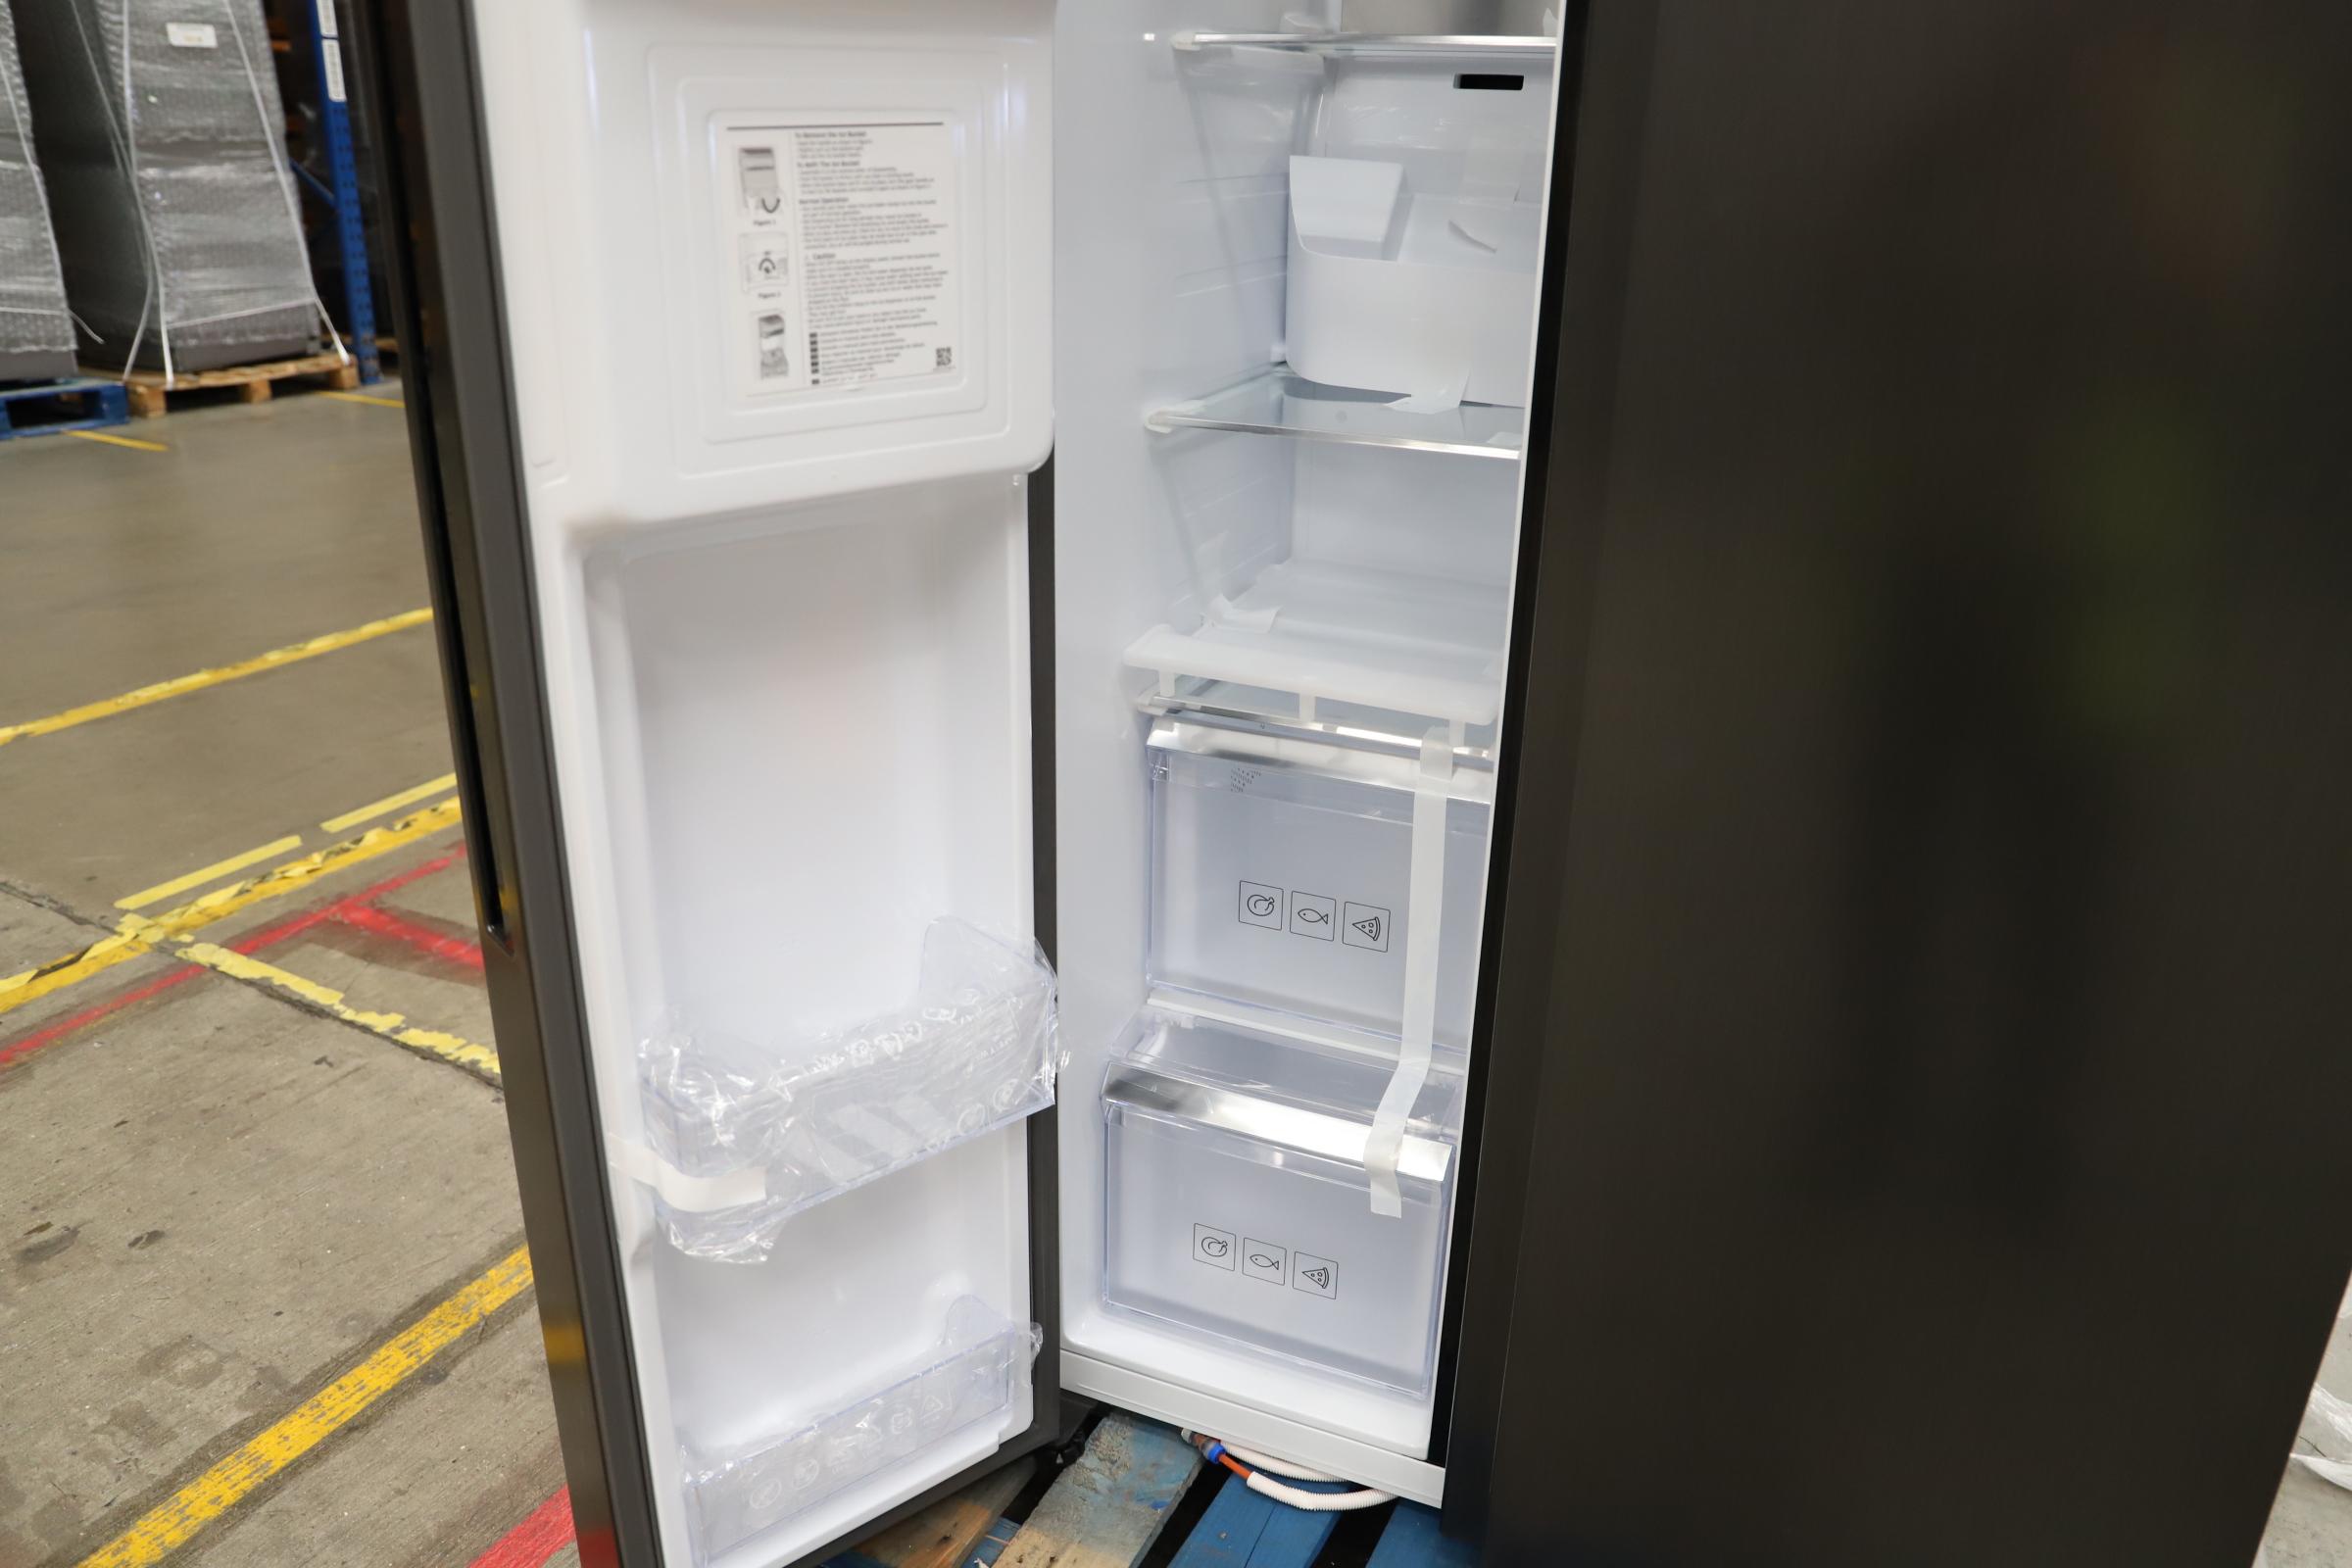 Pallet of 1 Samsung Water & Ice Fridge freezer. Latest selling price £1,799.99 - Image 6 of 10